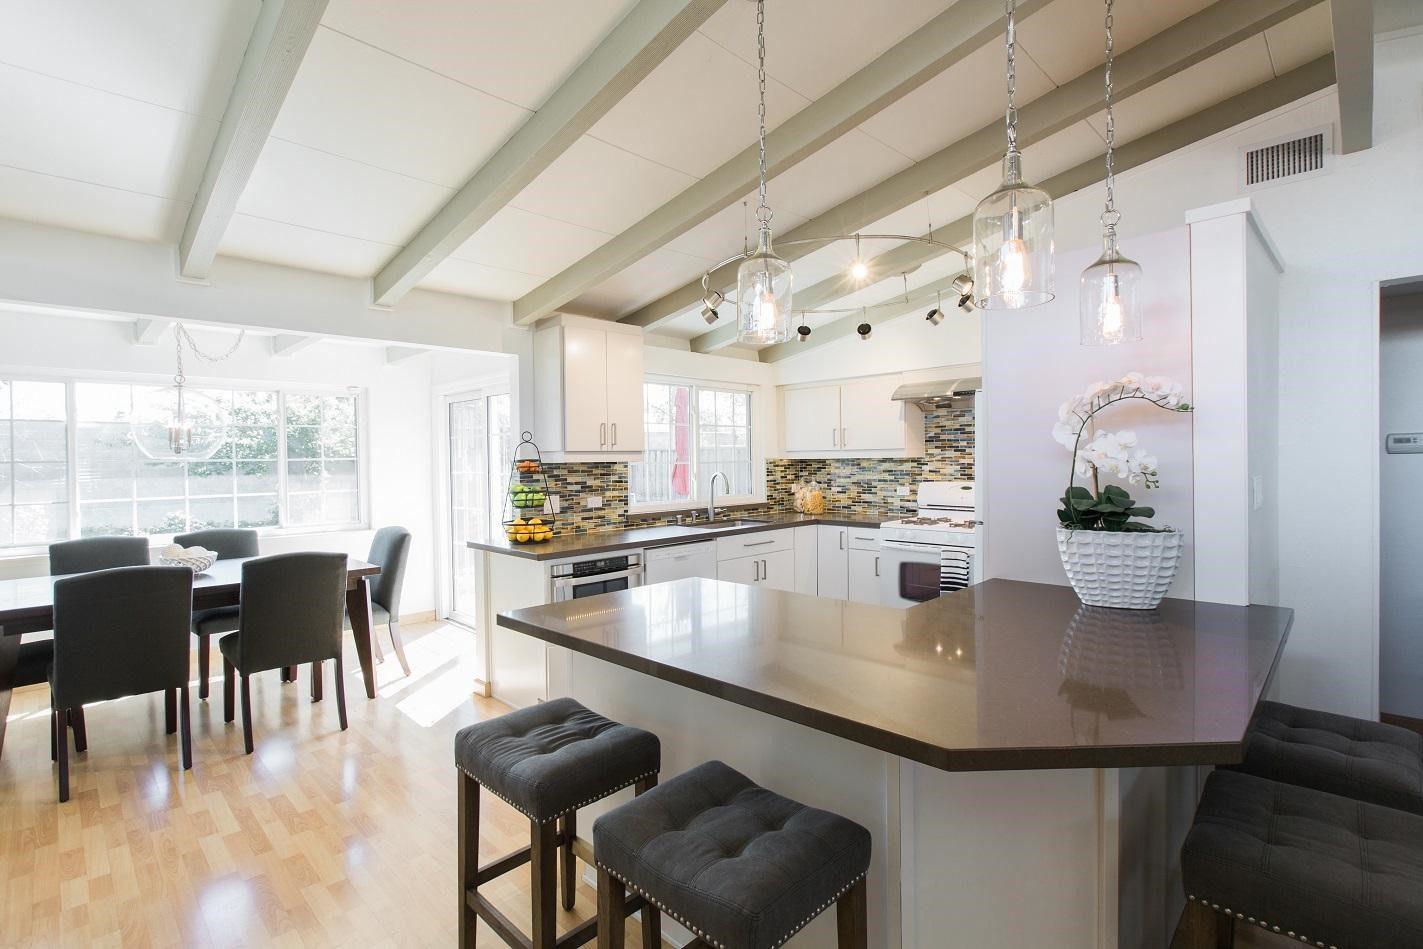 pendant lights for kitchen island whirlpool appliance package decor ideas open floor plans | case design/remodeling ...